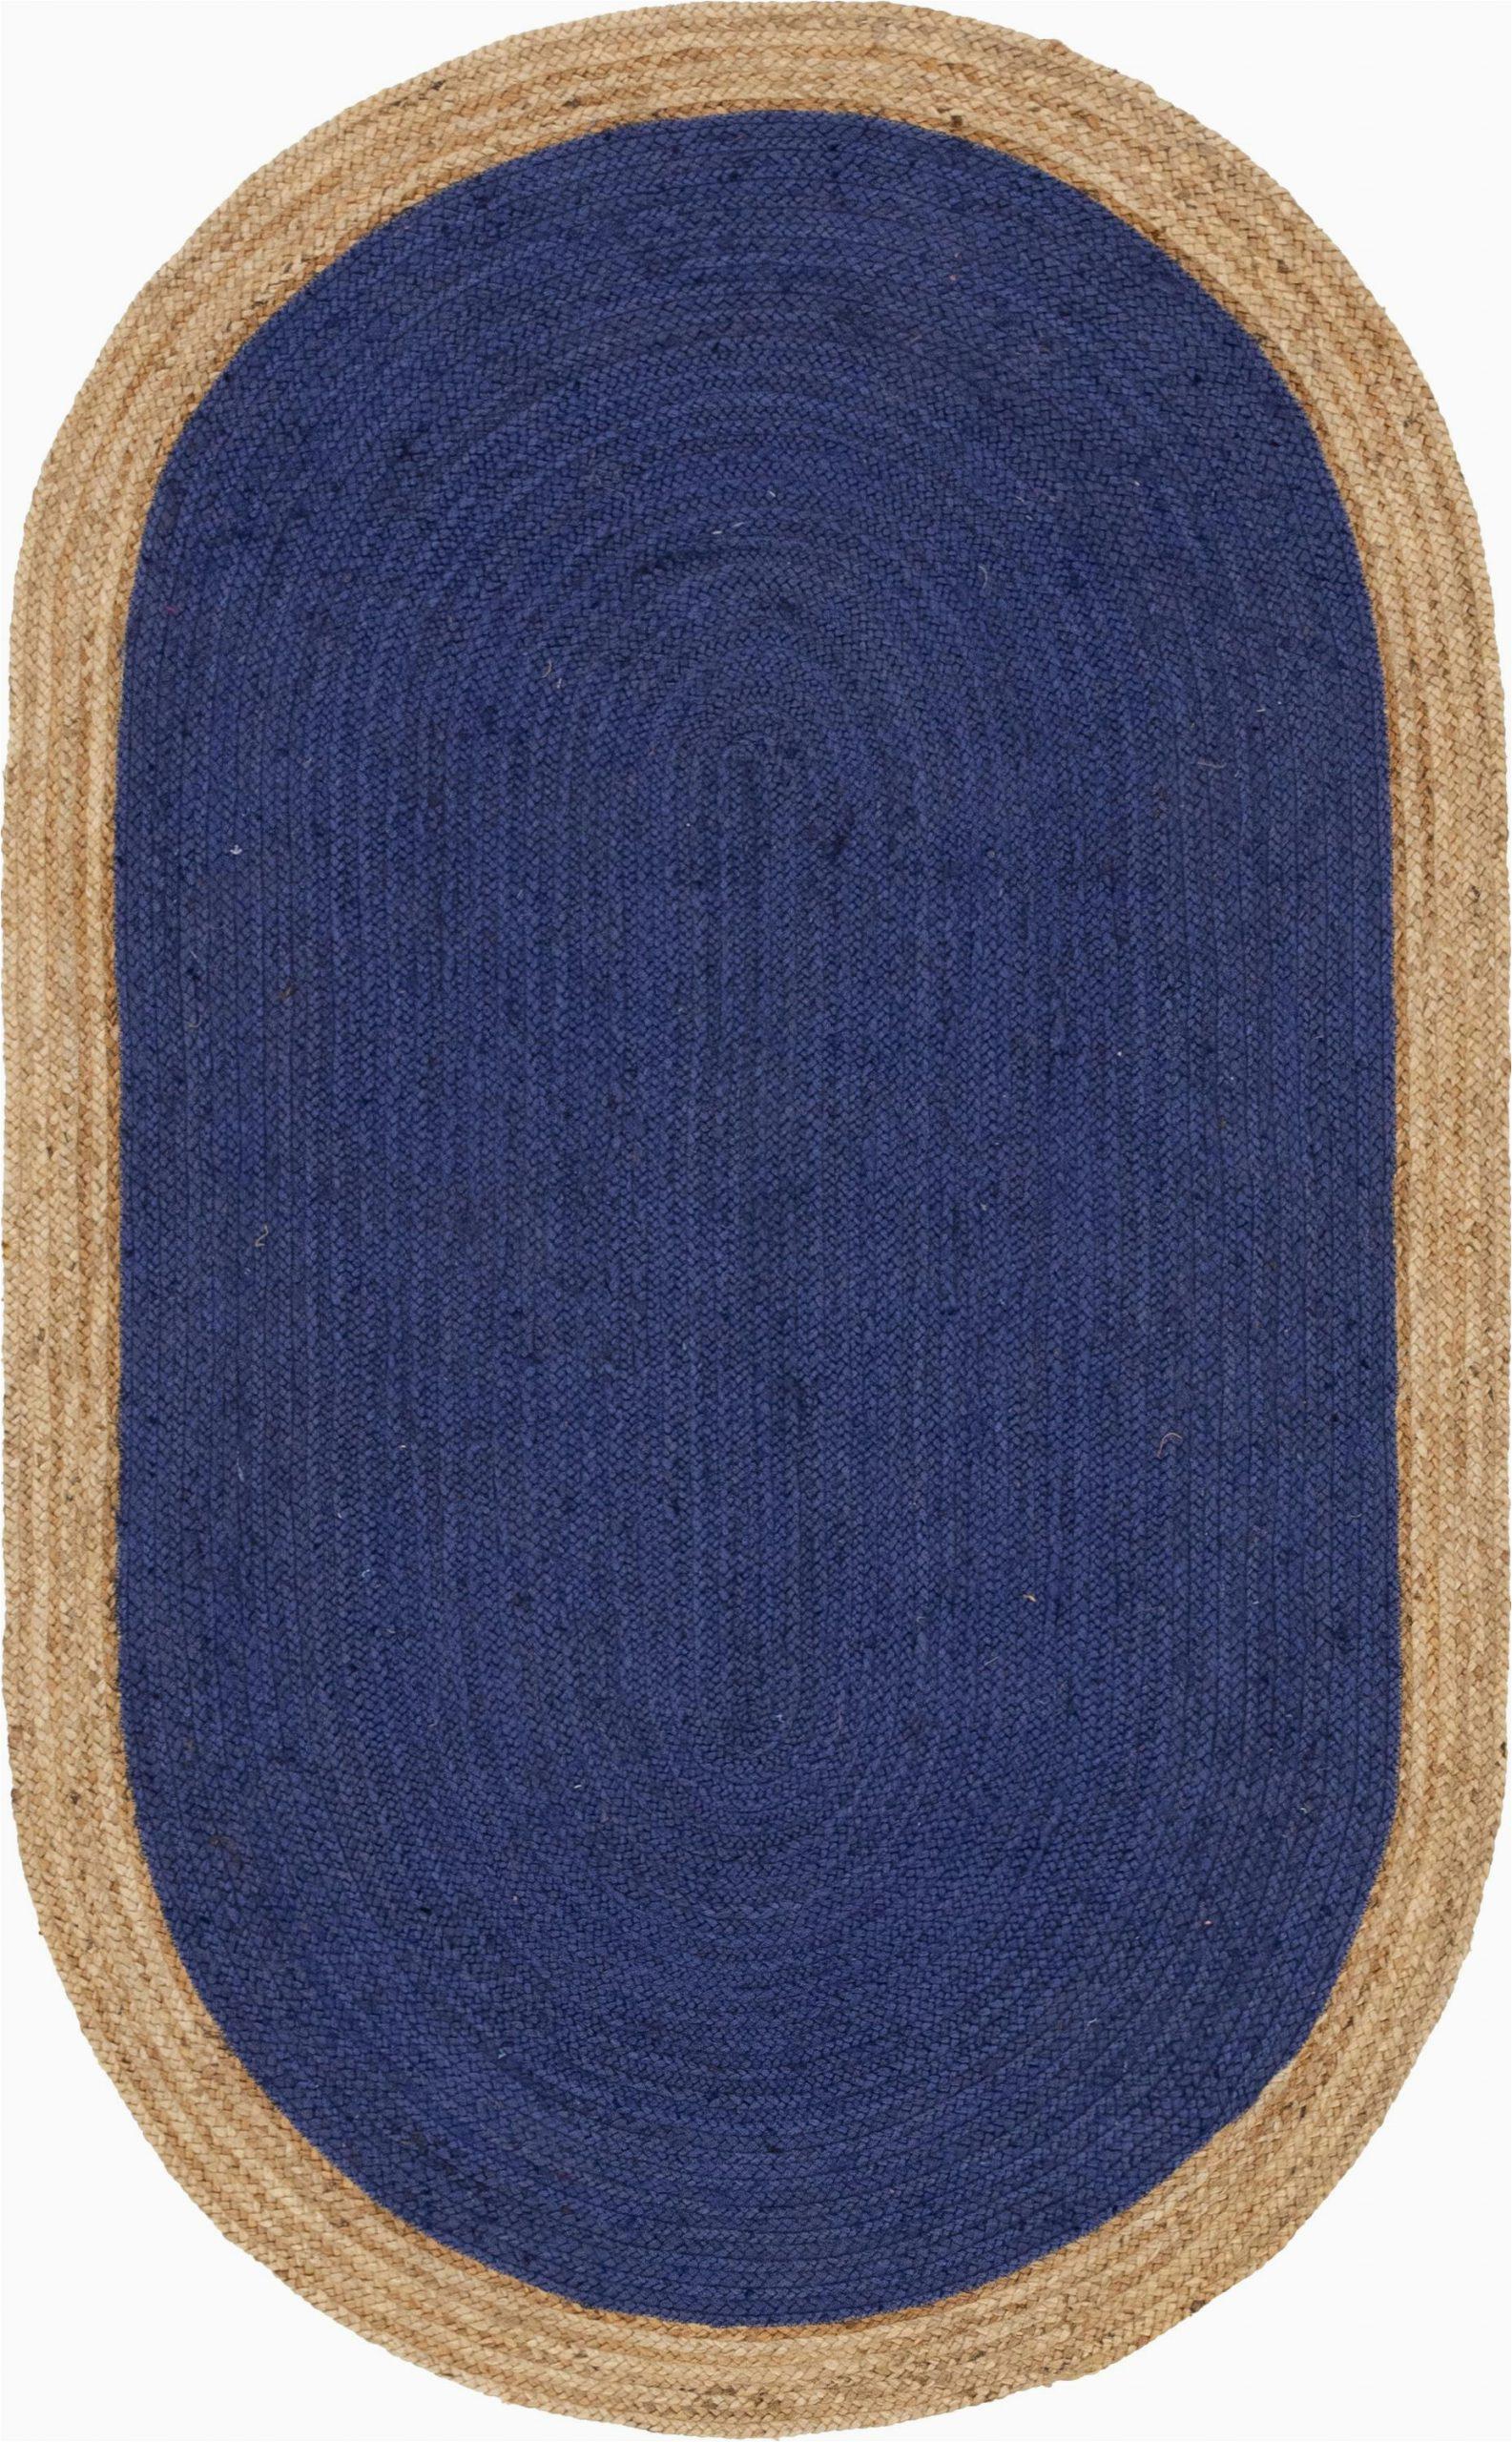 Navy Blue Braided Rugs Navy Blue 5 X 8 Braided Jute Oval Rug Sponsored